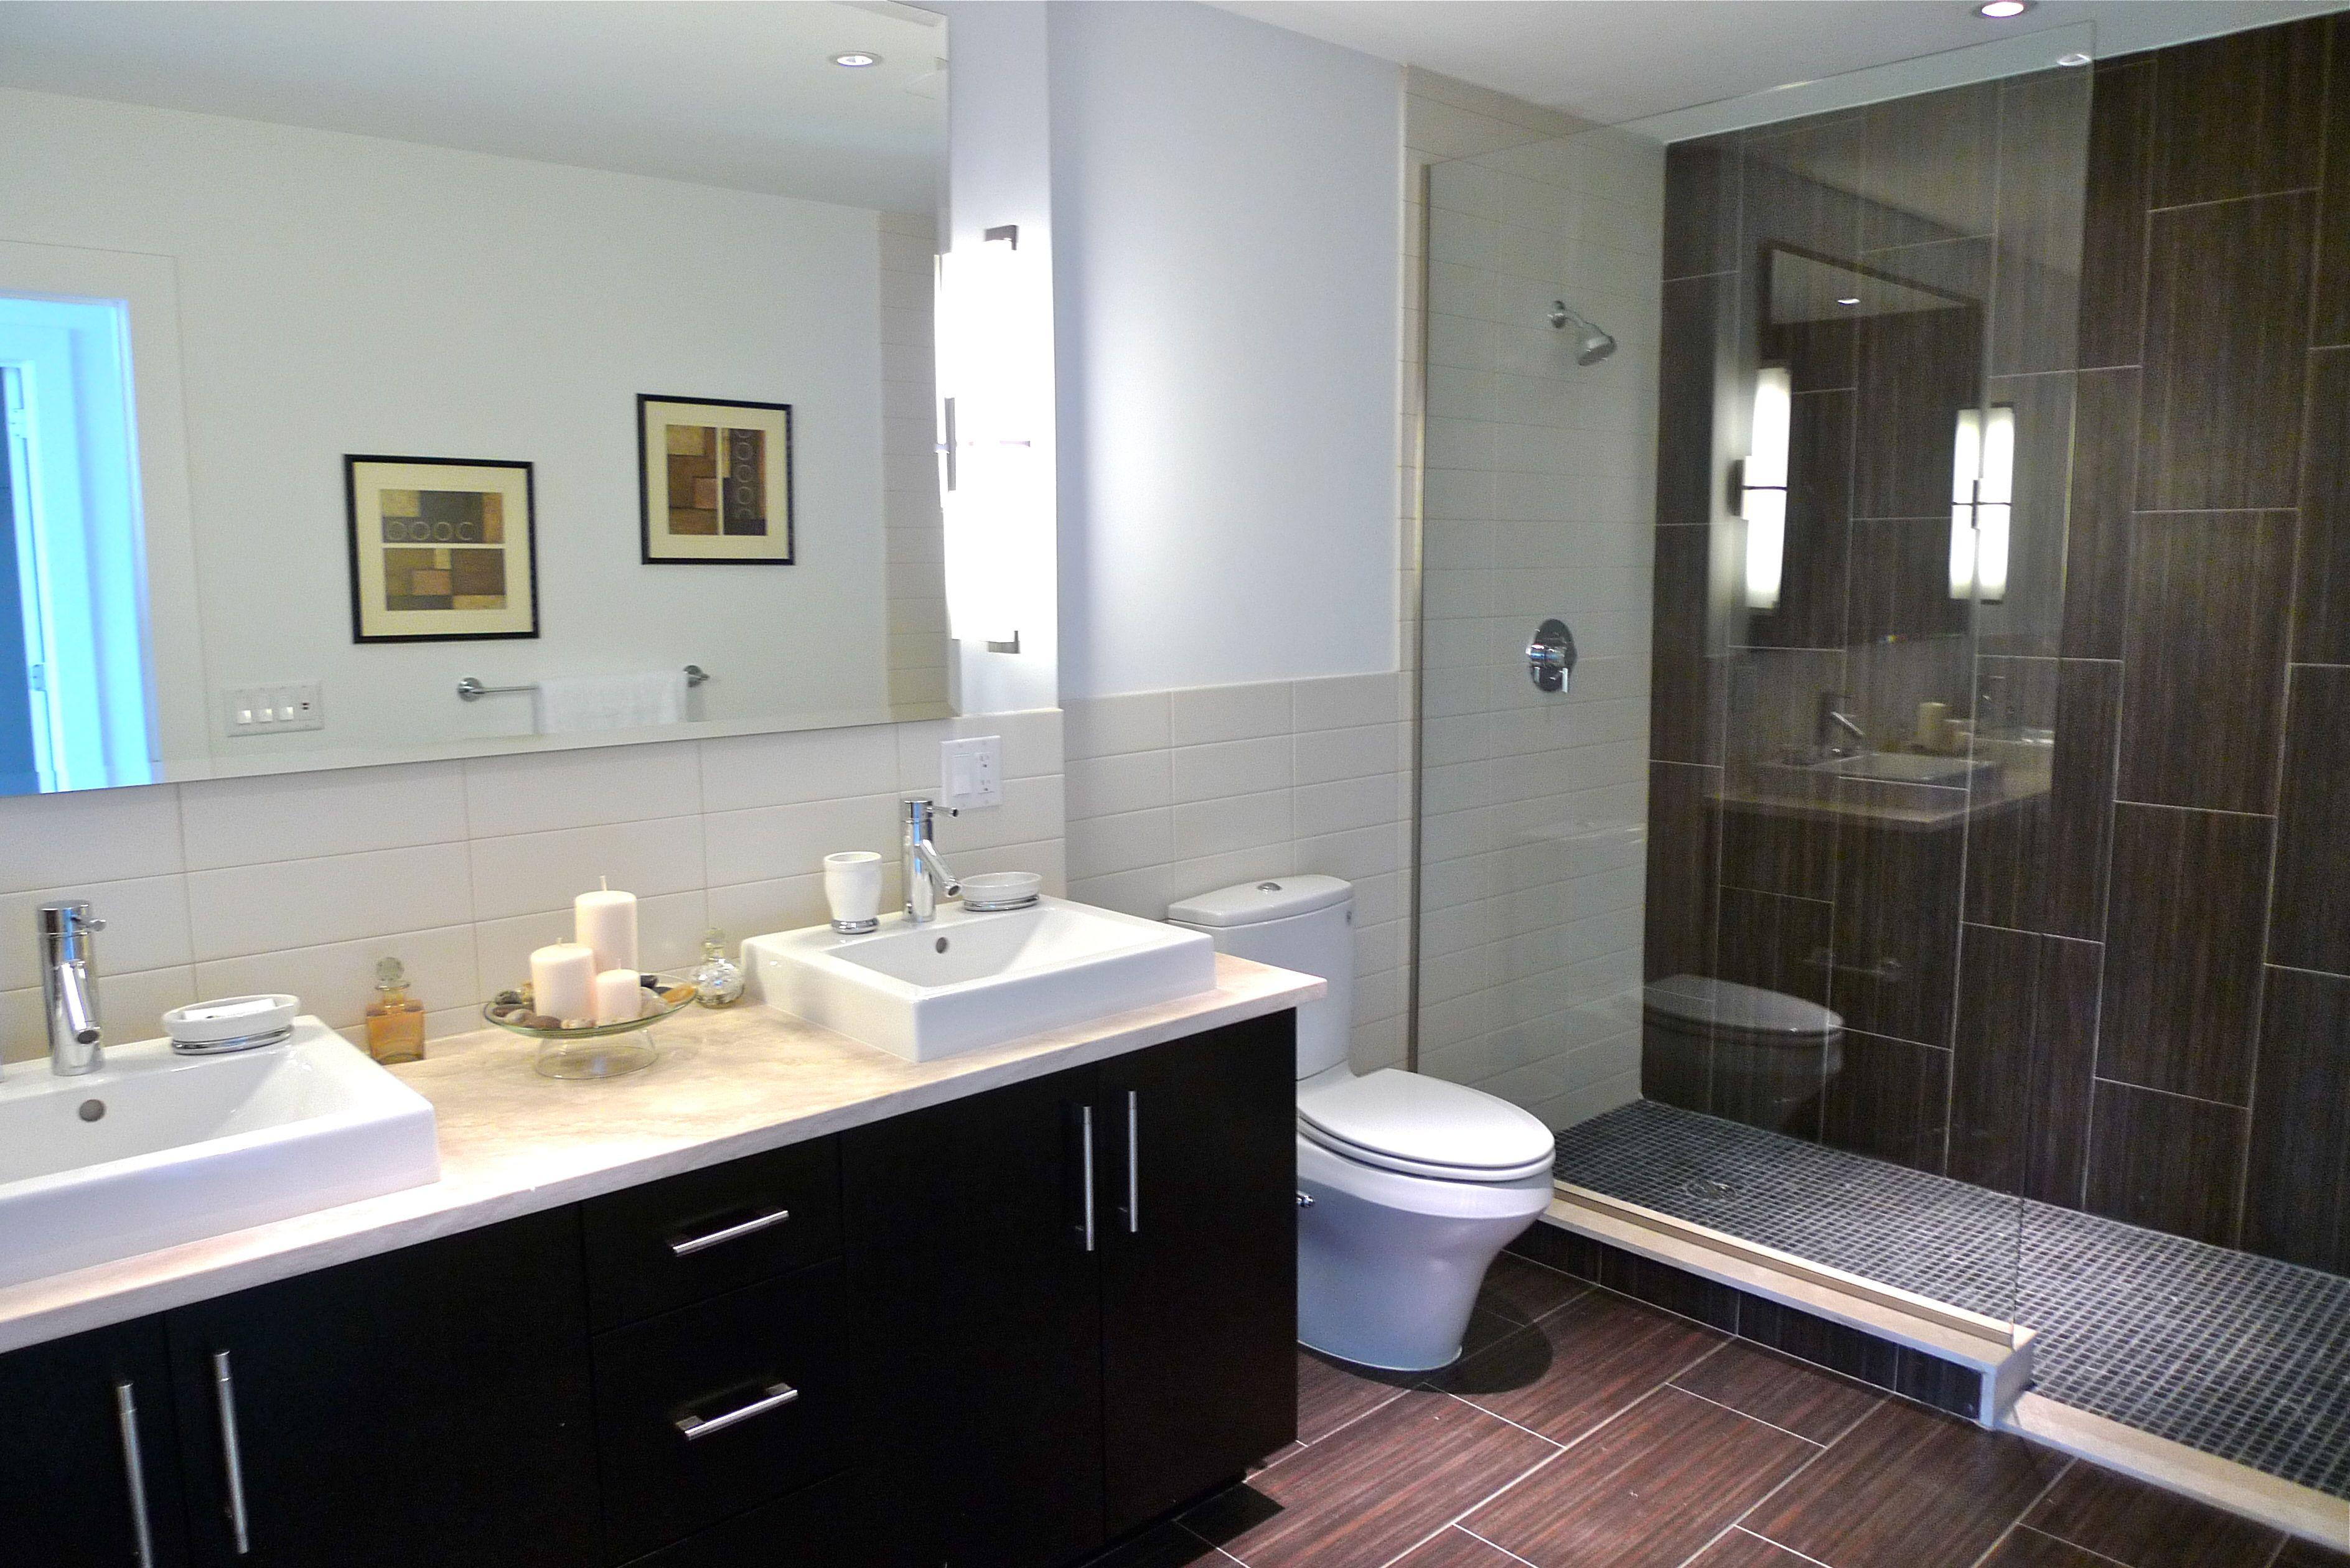 spa bathroom pics photo - 1